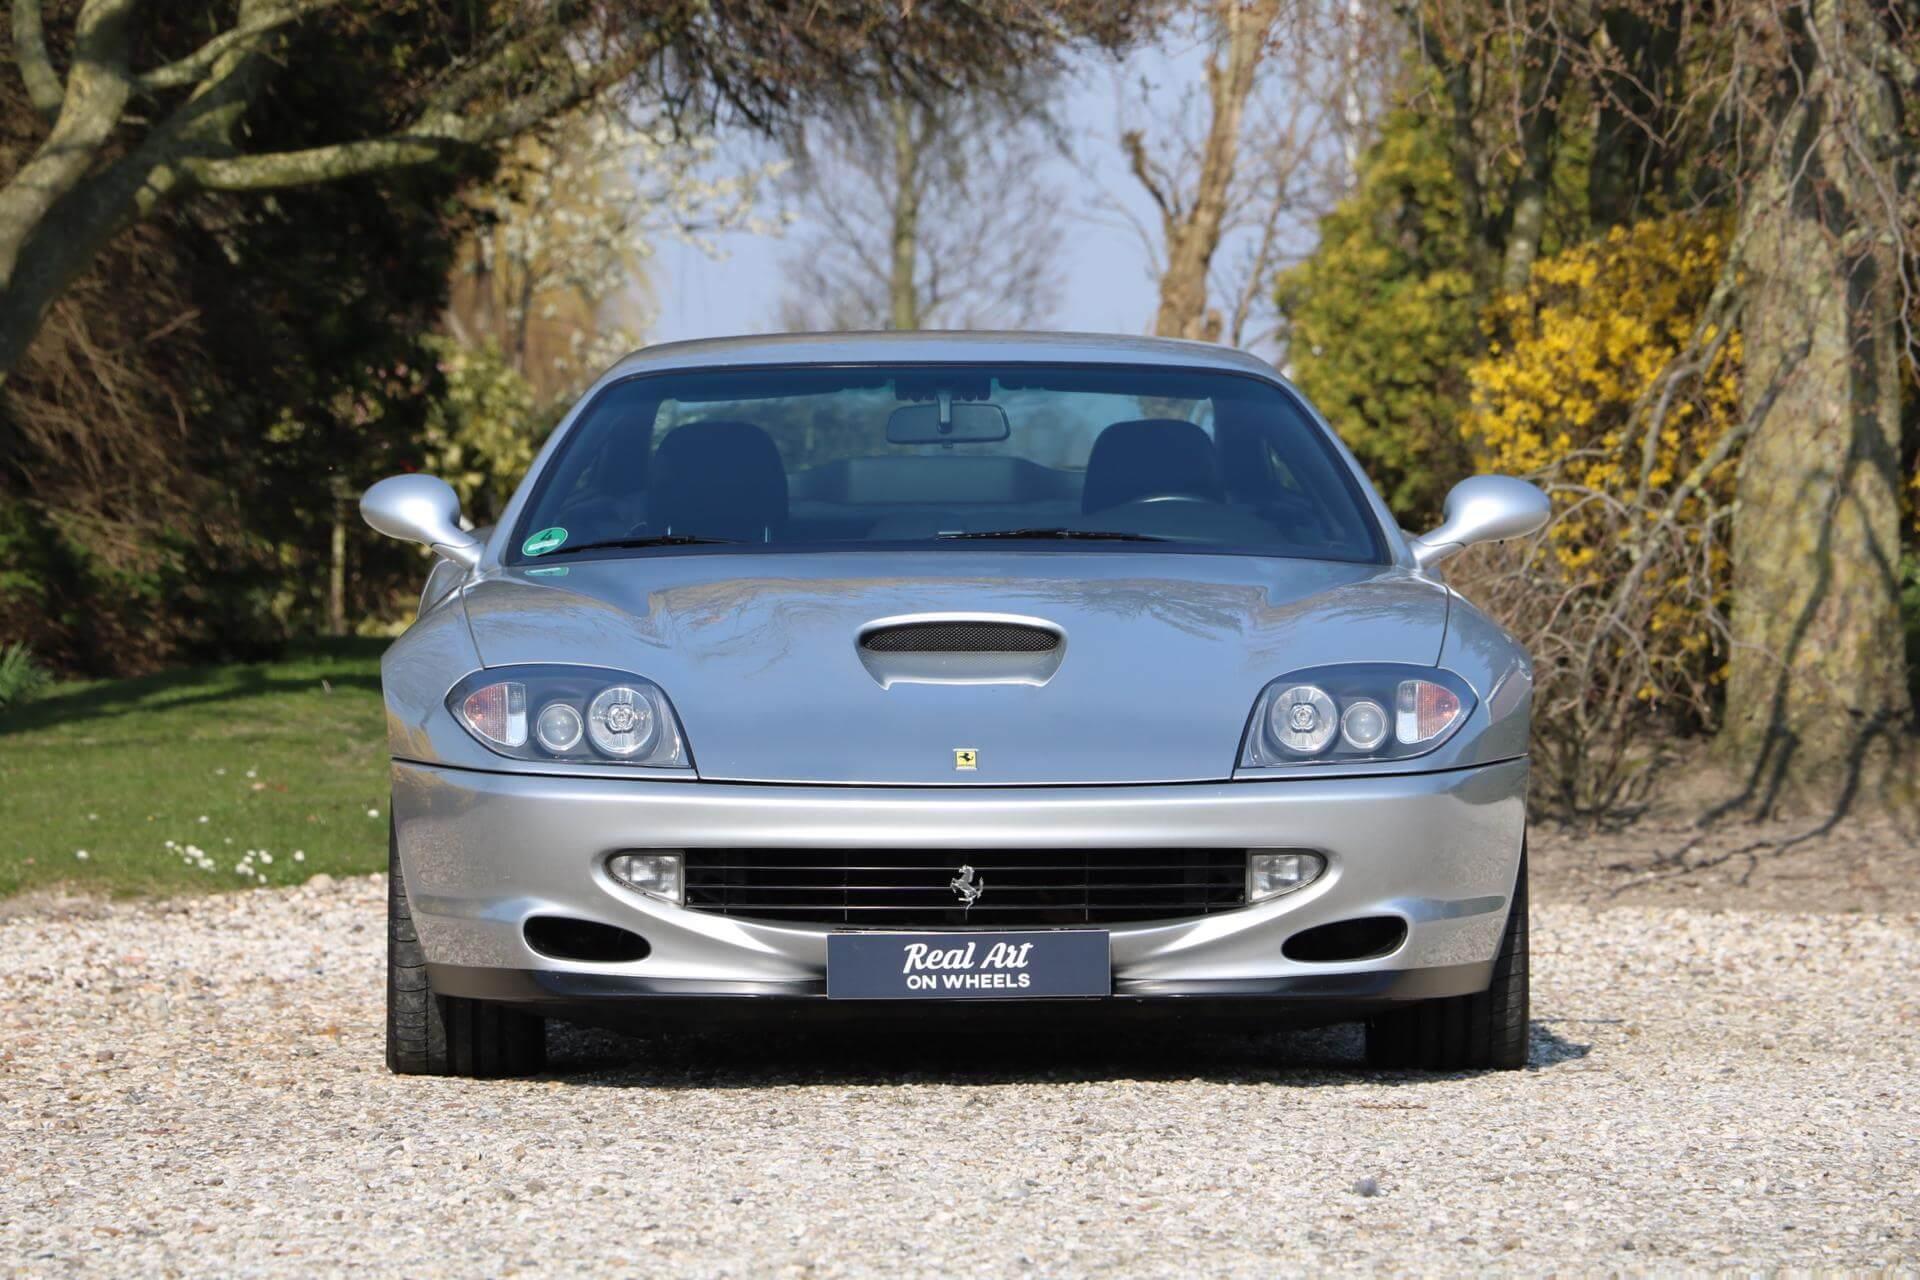 Real Art on Wheels   1998 Ferrari 550 Maranello